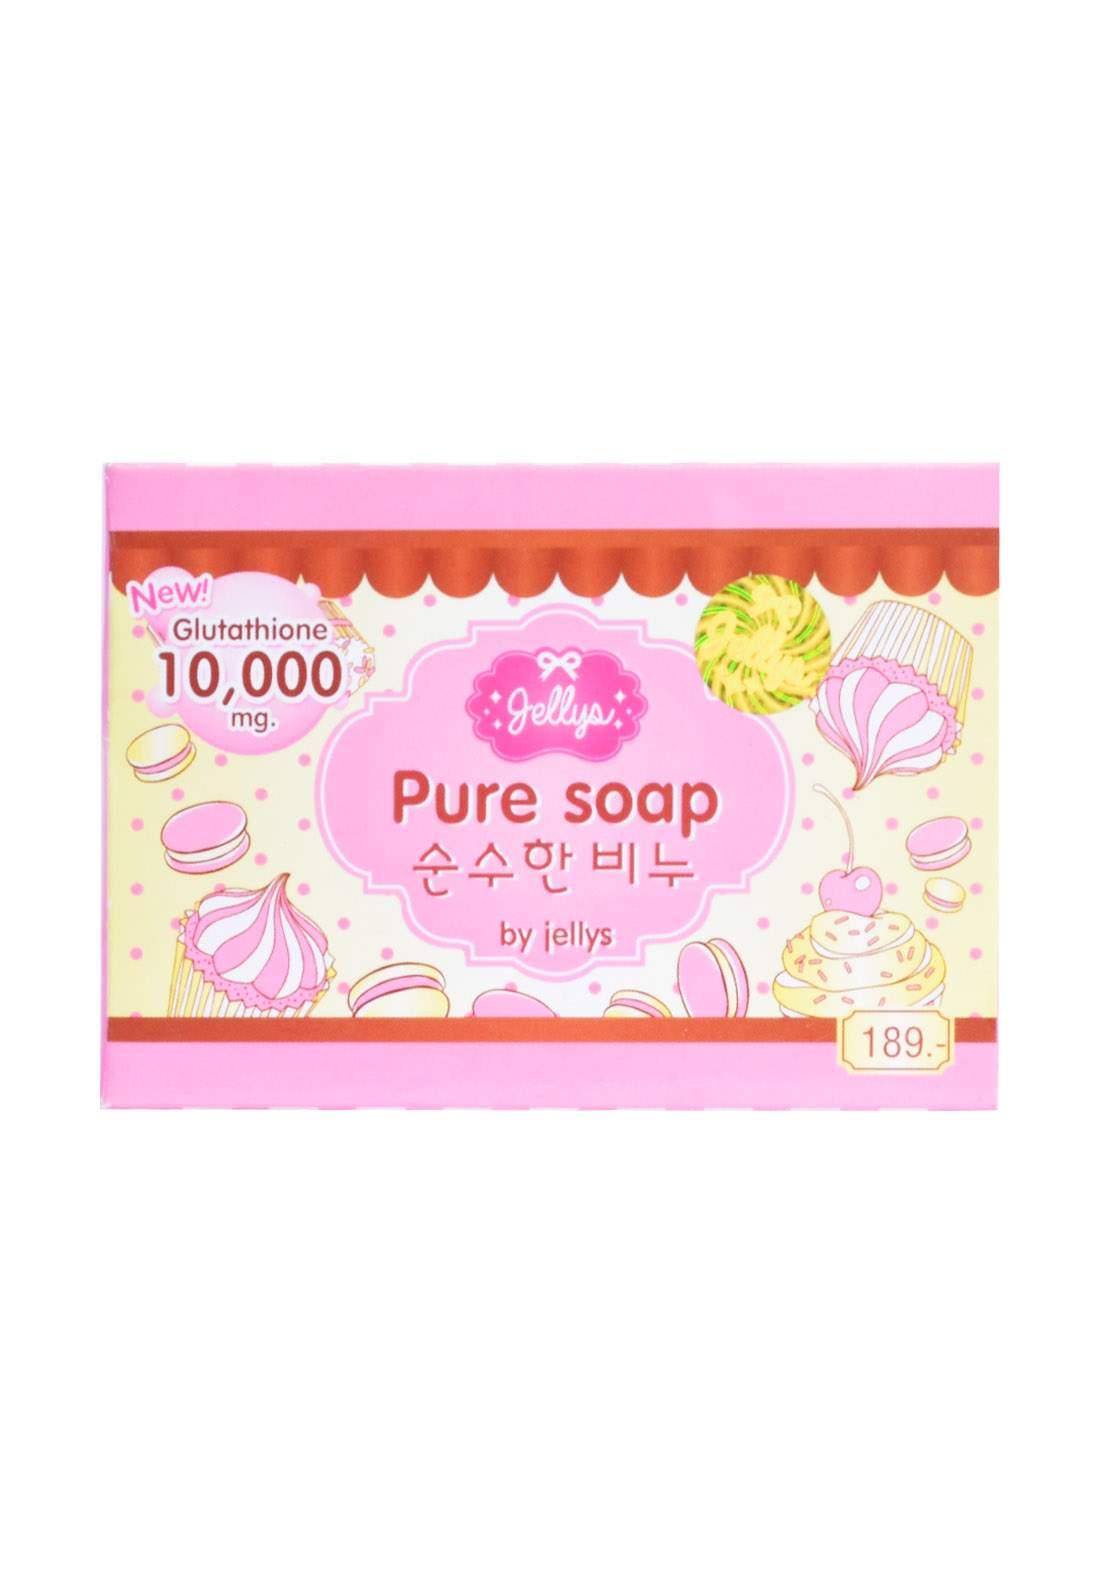 Jellys Glutathione Pure Soap Safe Whitening Healthy  100 g صابونة للبشرة